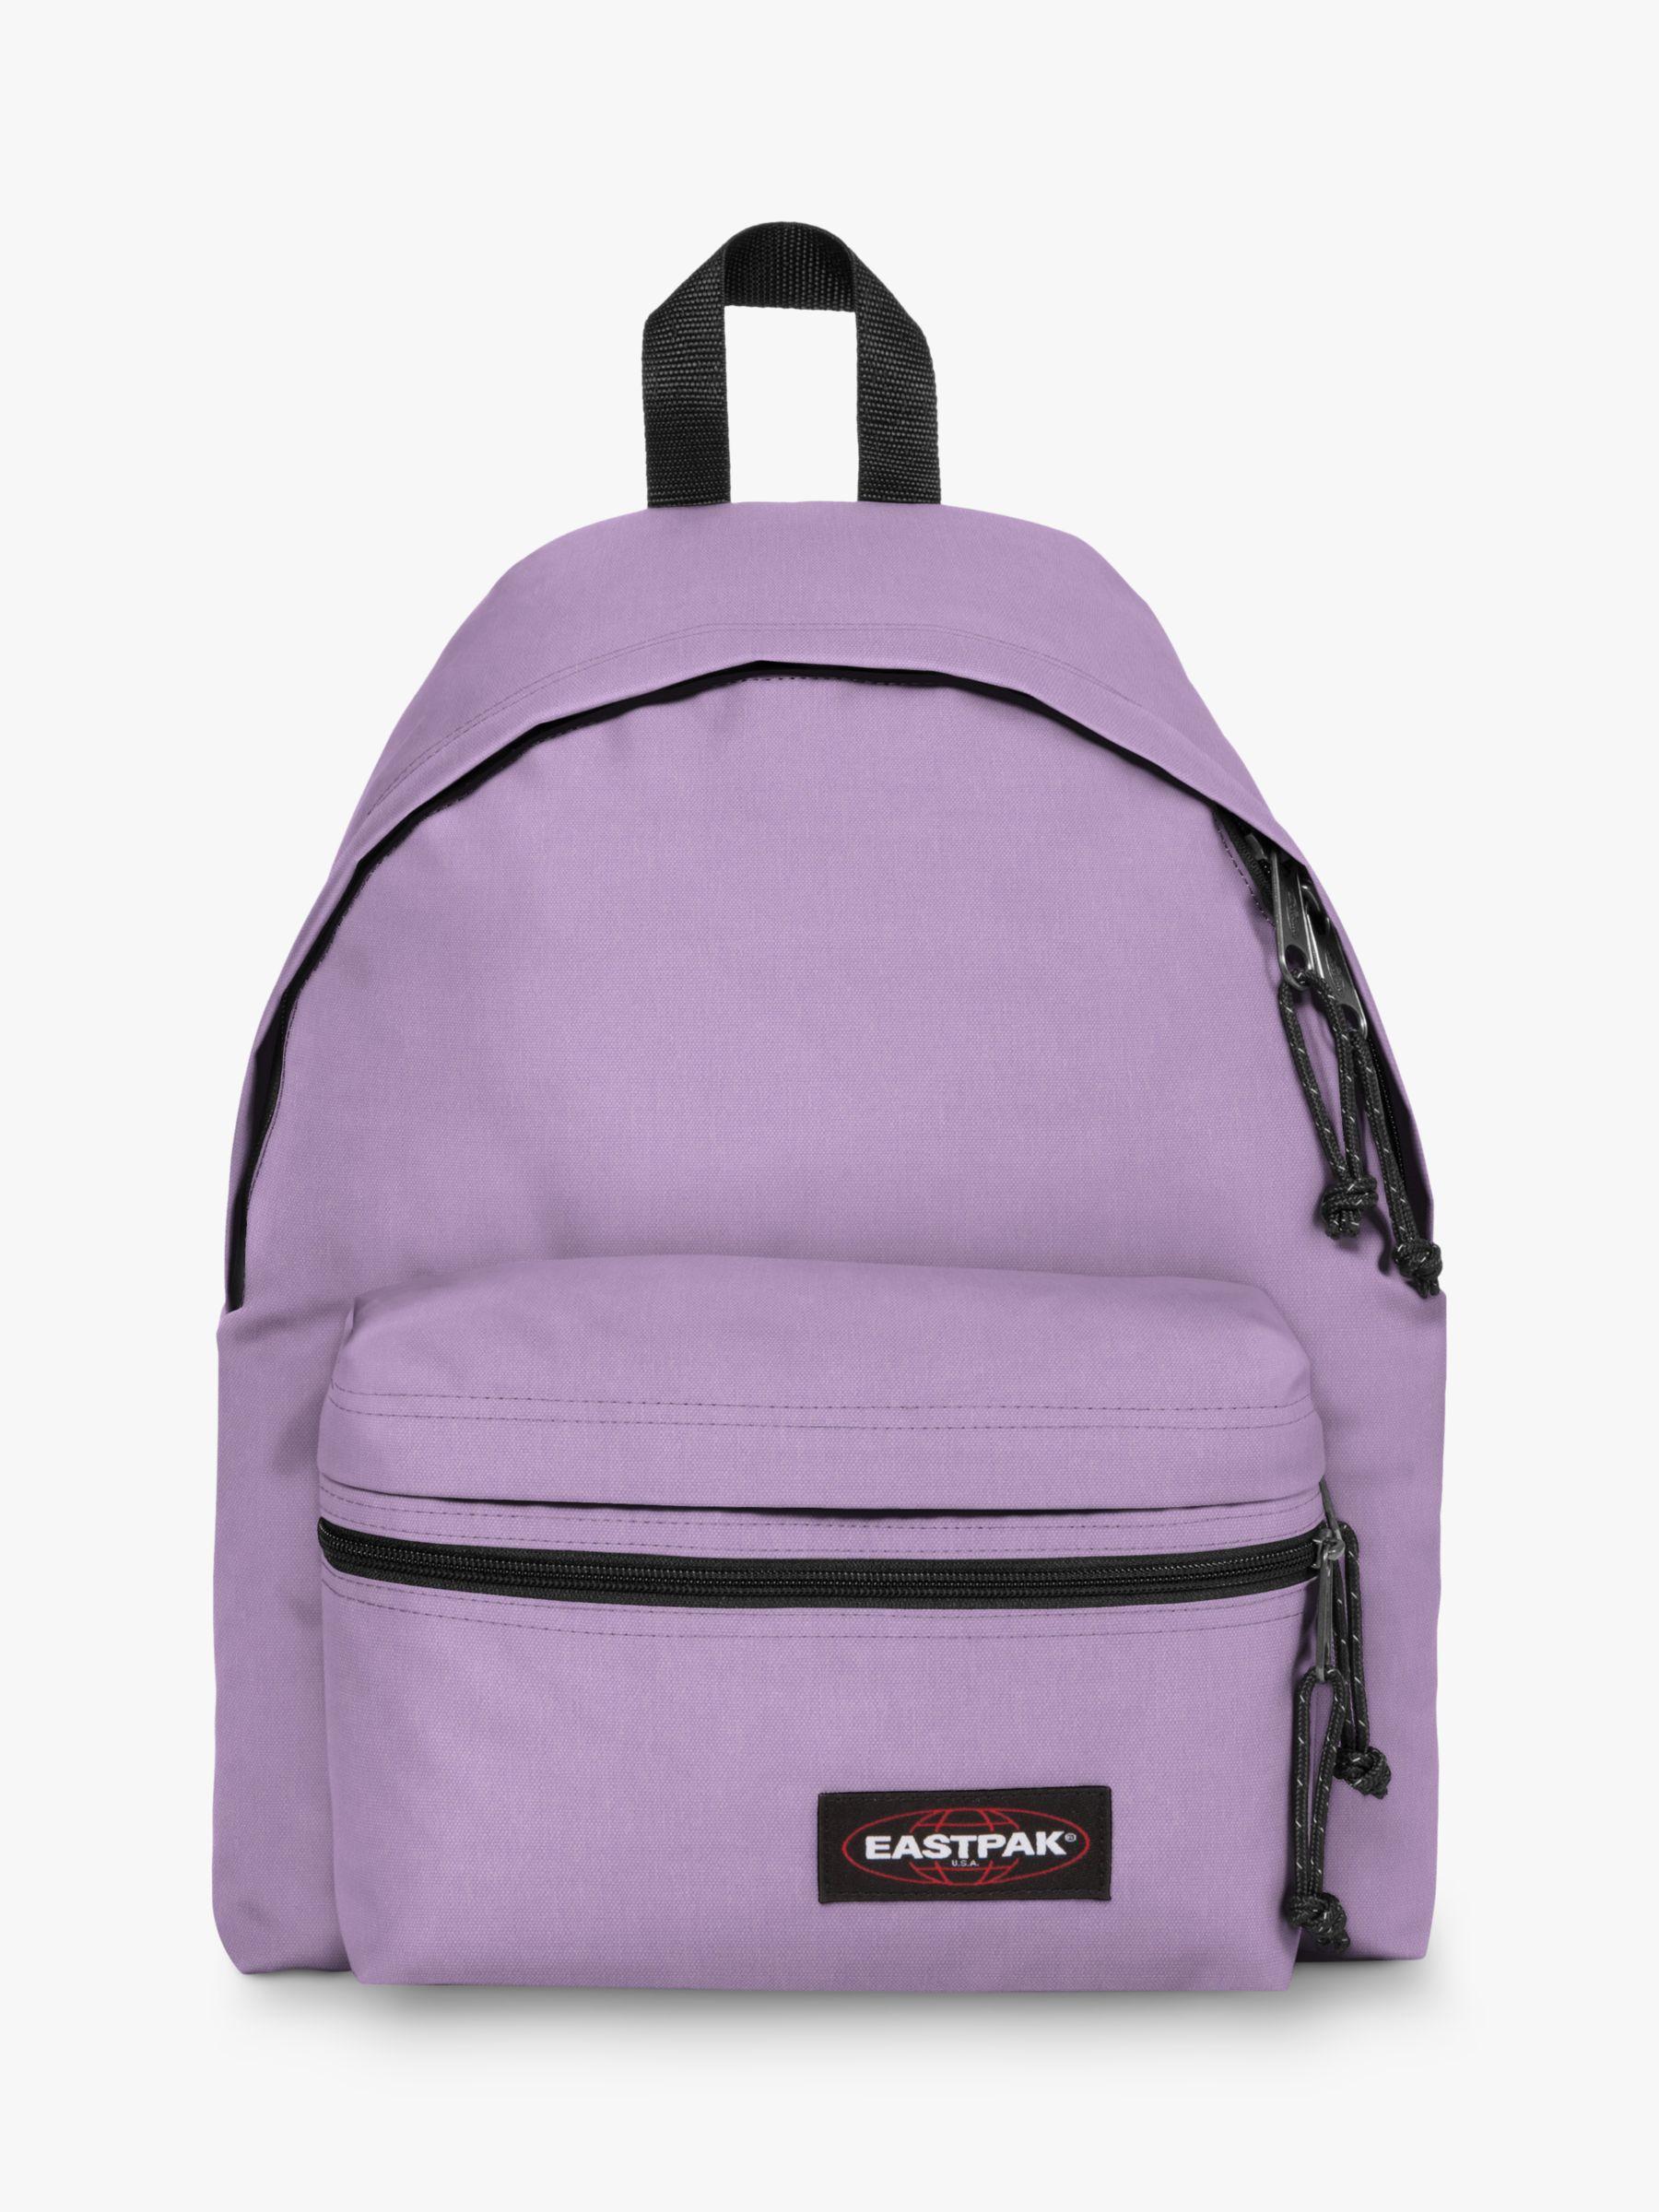 ed211d8c8c5 Eastpak Padded Zippl'r Backpack at John Lewis & Partners